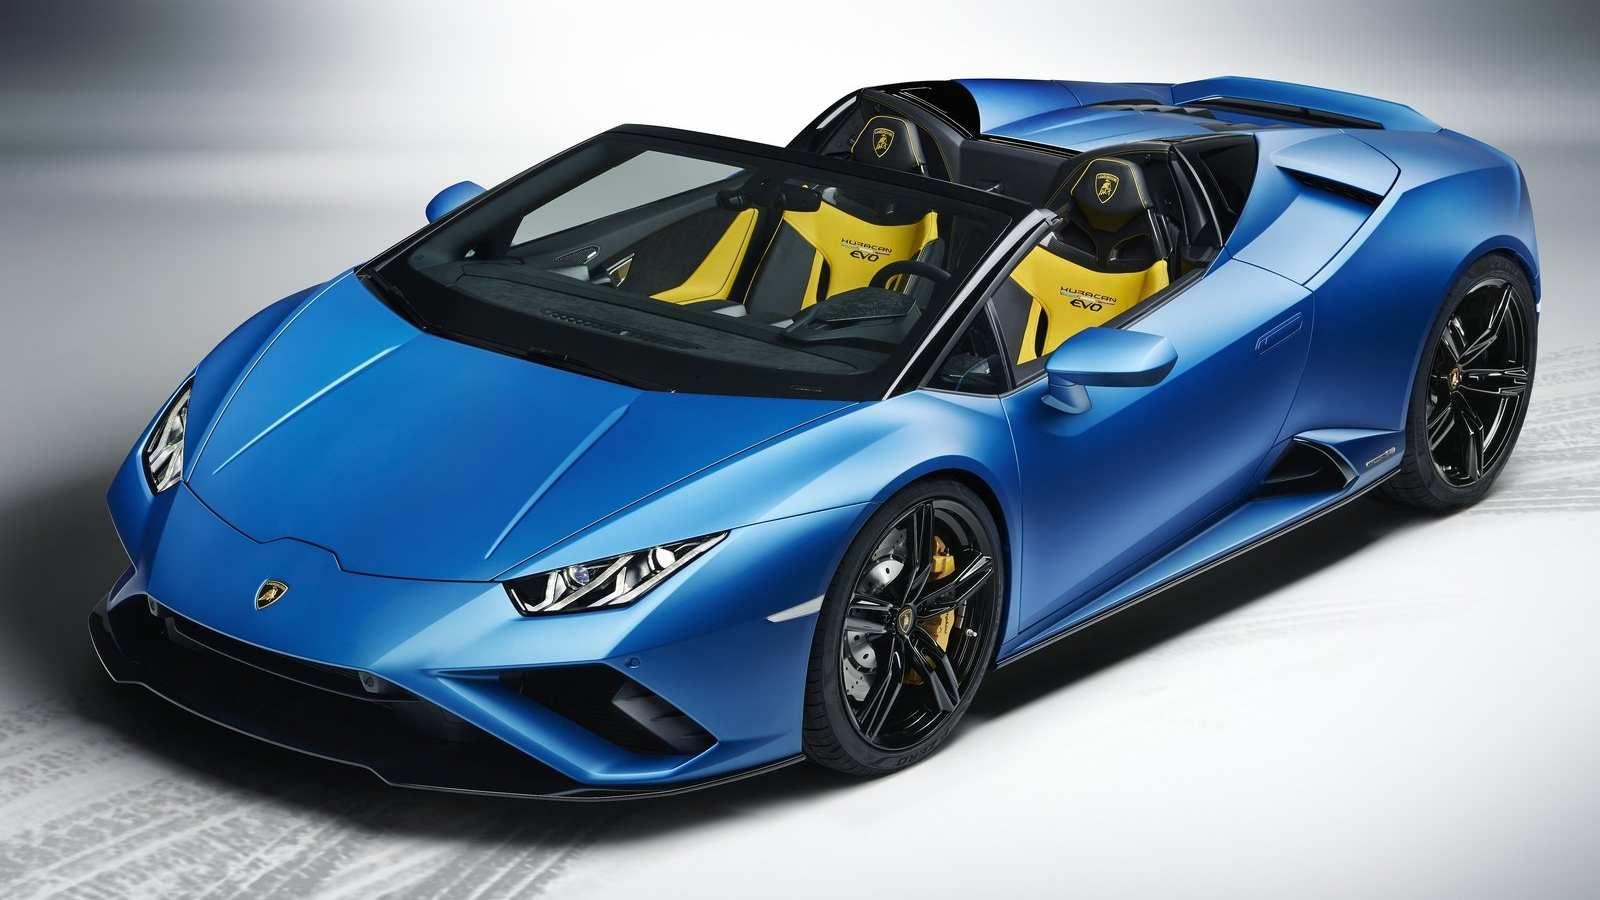 The Lamborghini Huracan EVO RWD Spyder can do 0-100 kph in a claimed 3.5 seconds. Image: Lamborghini